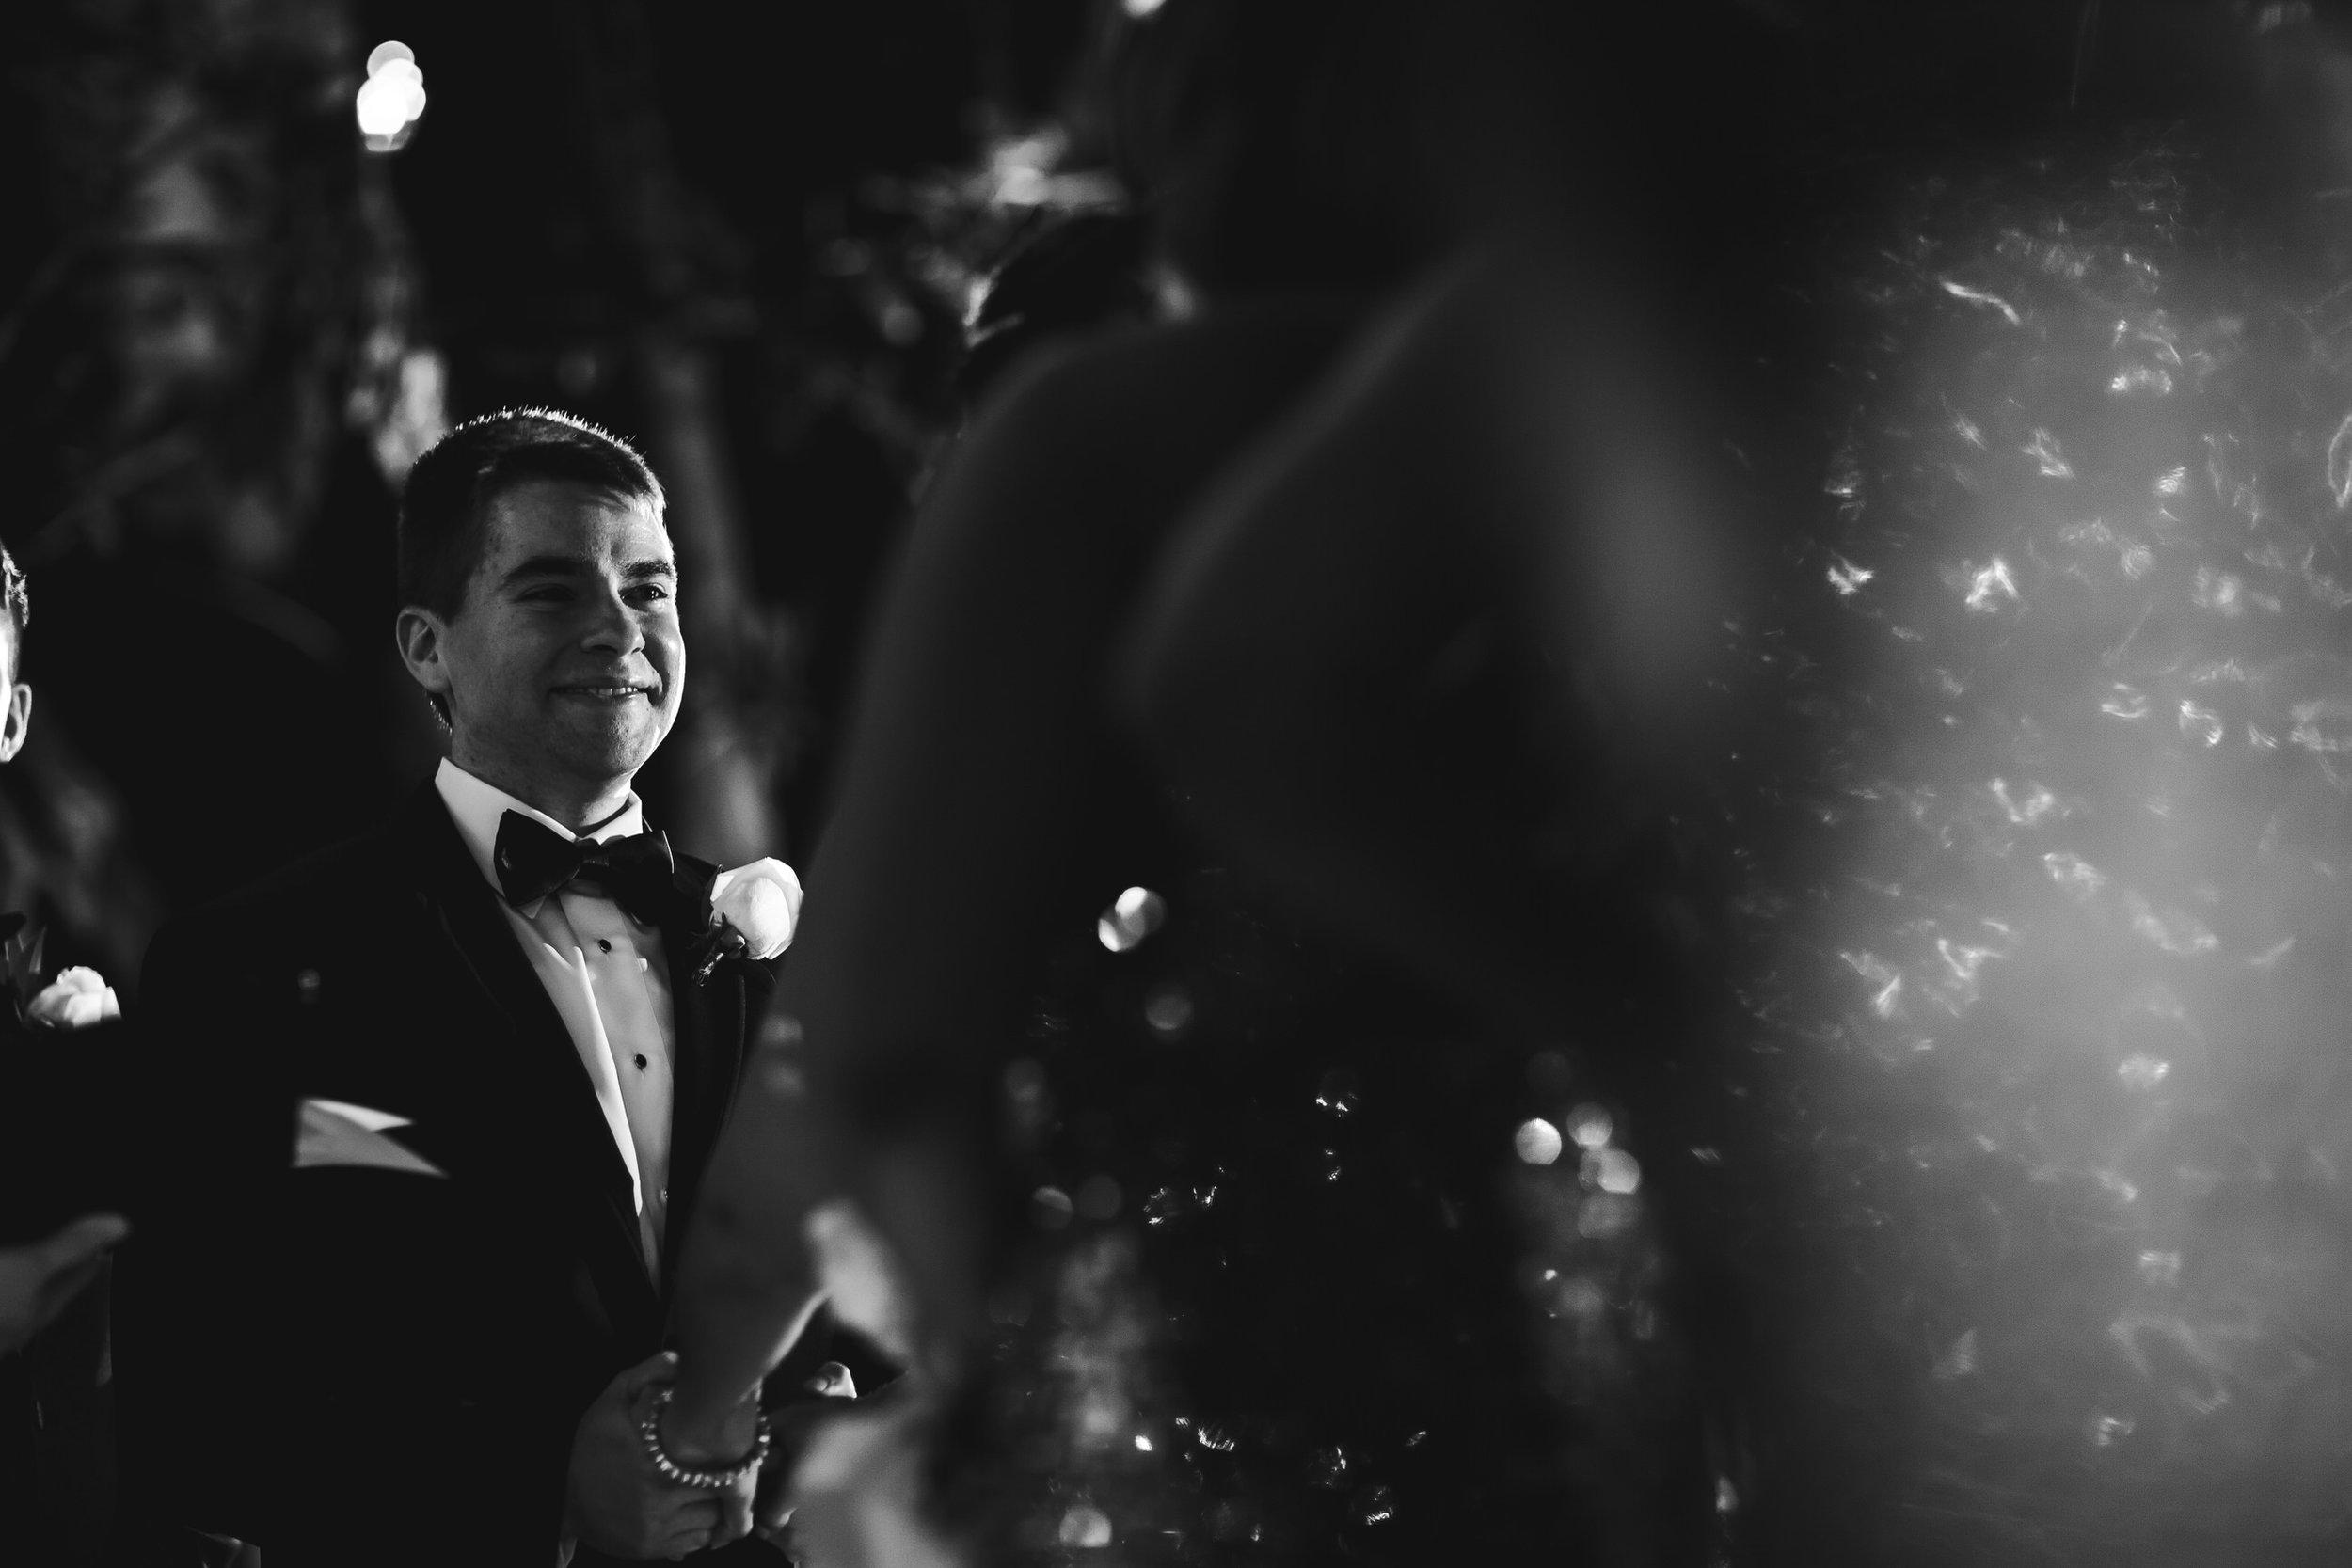 wedding_ceremony_moments_tiny_house_photo_professional_wedding_photographer.jpg